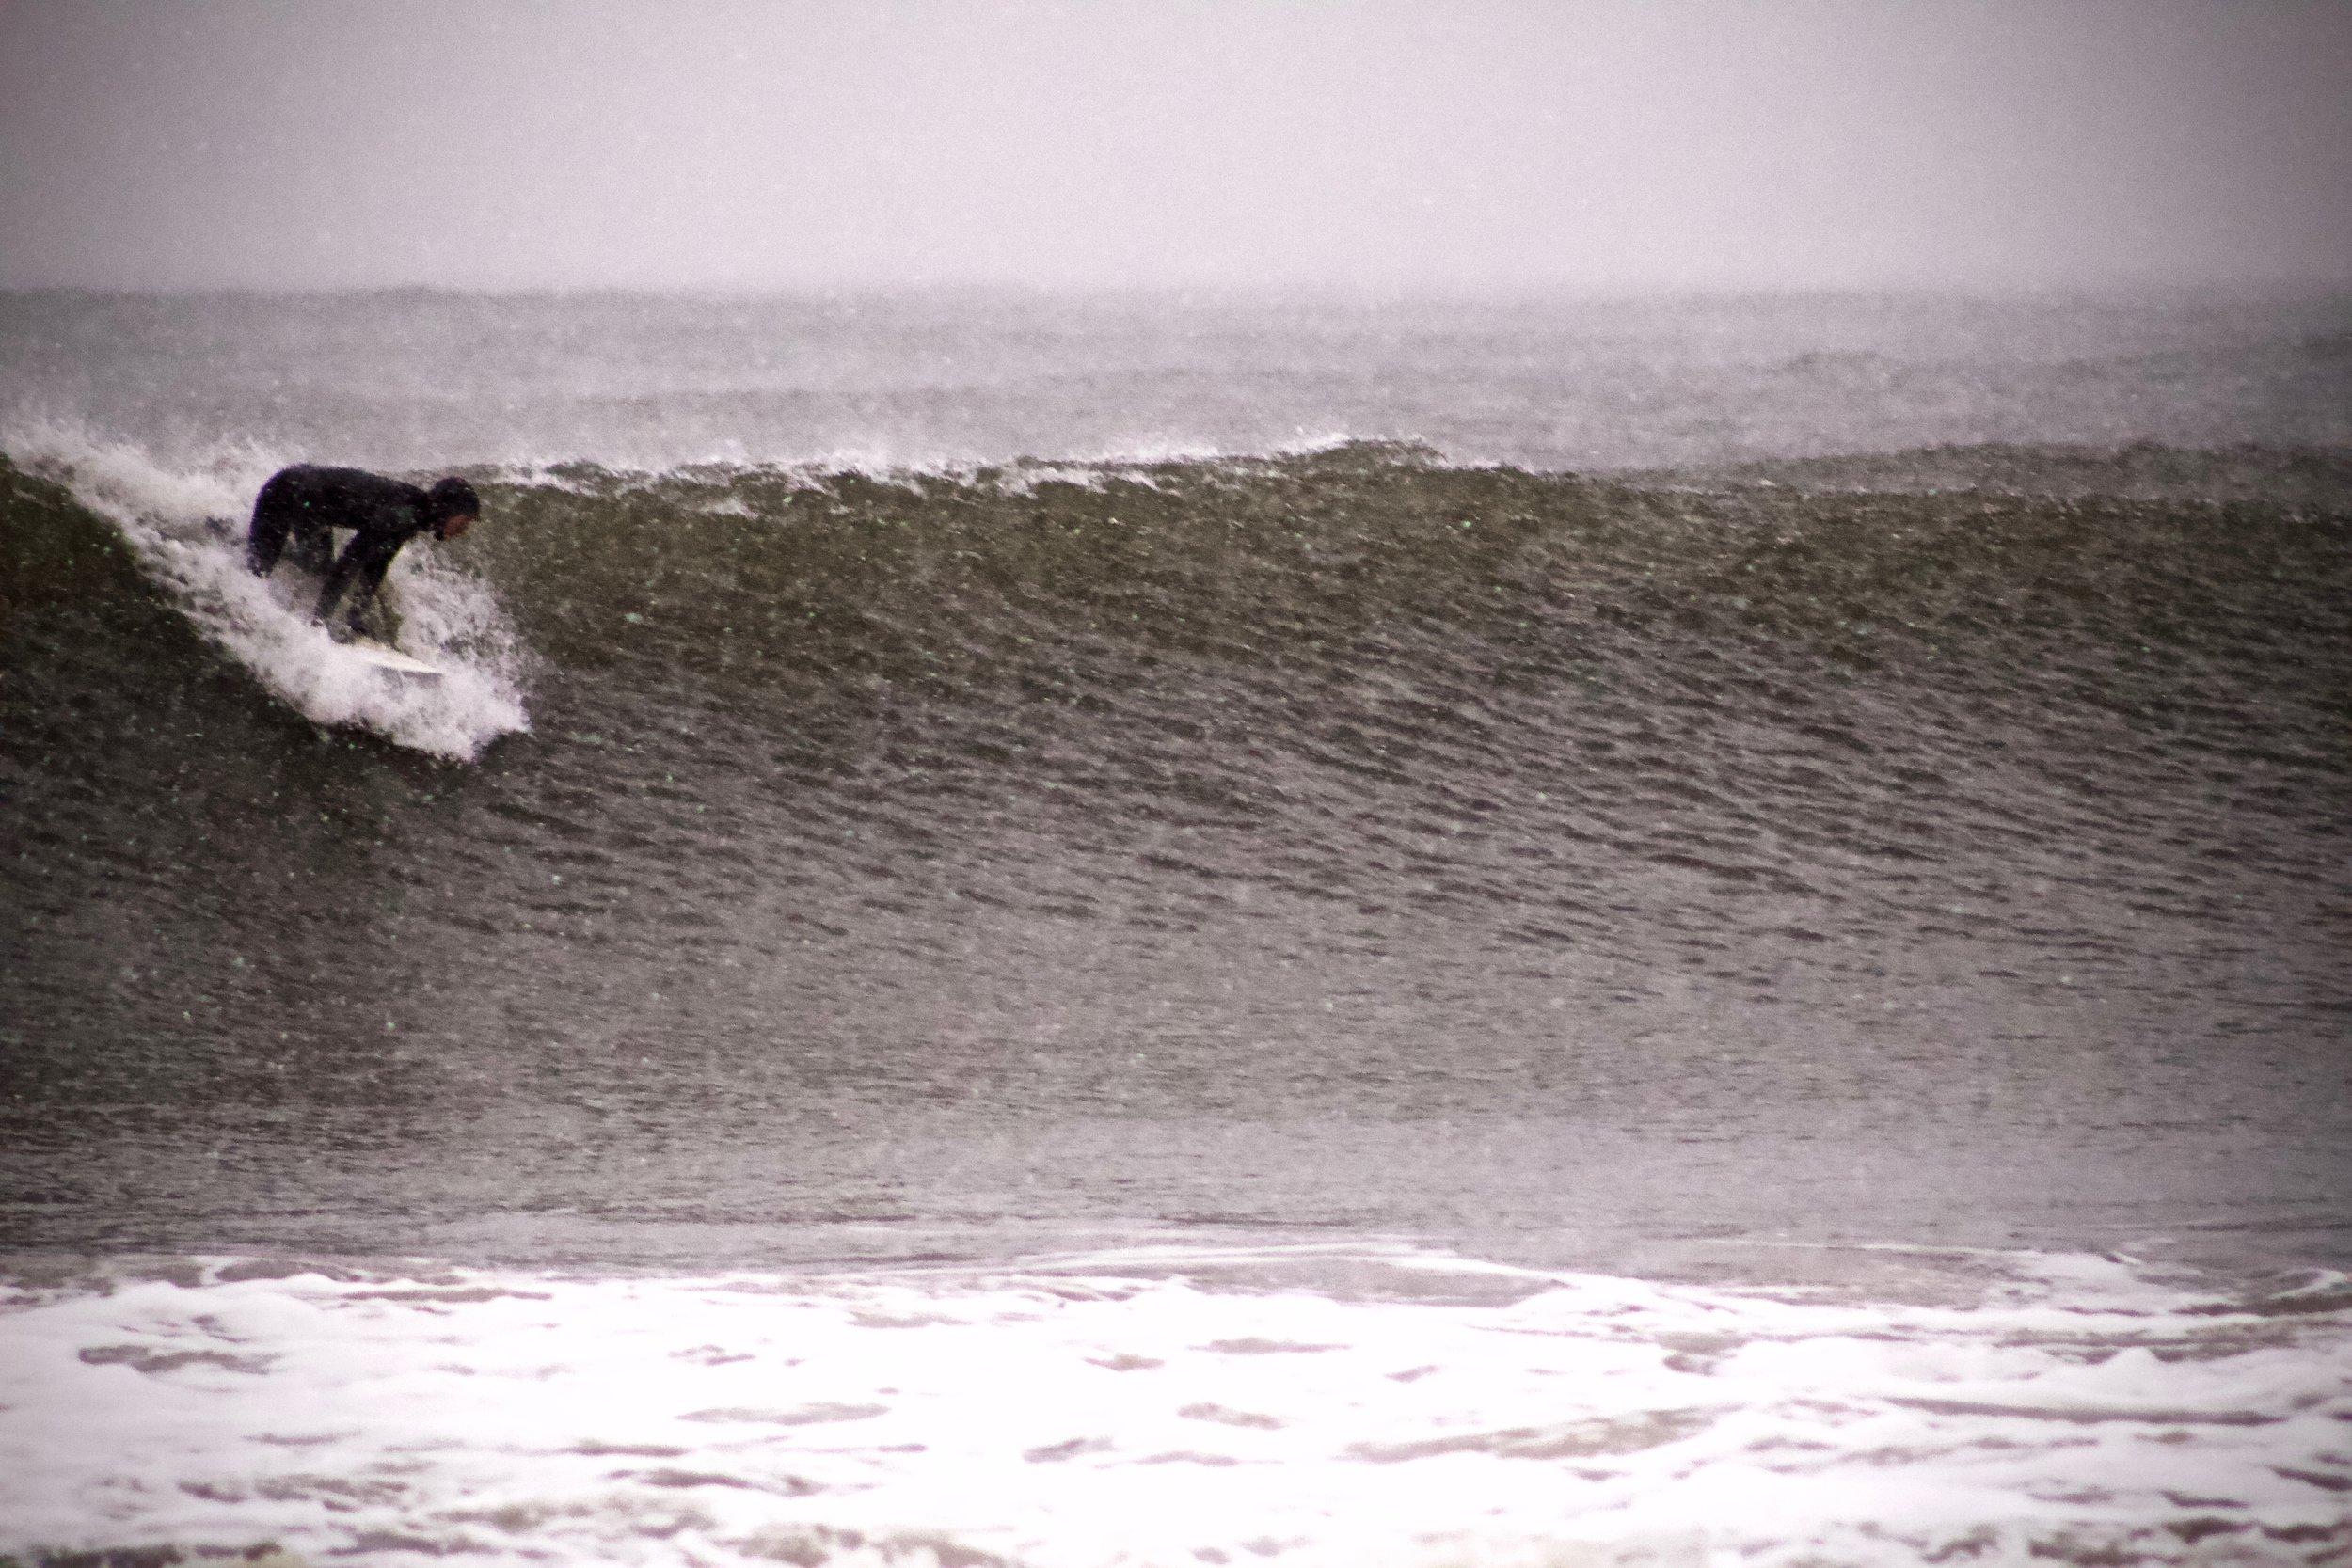 Snow & Waves (Long Beach)